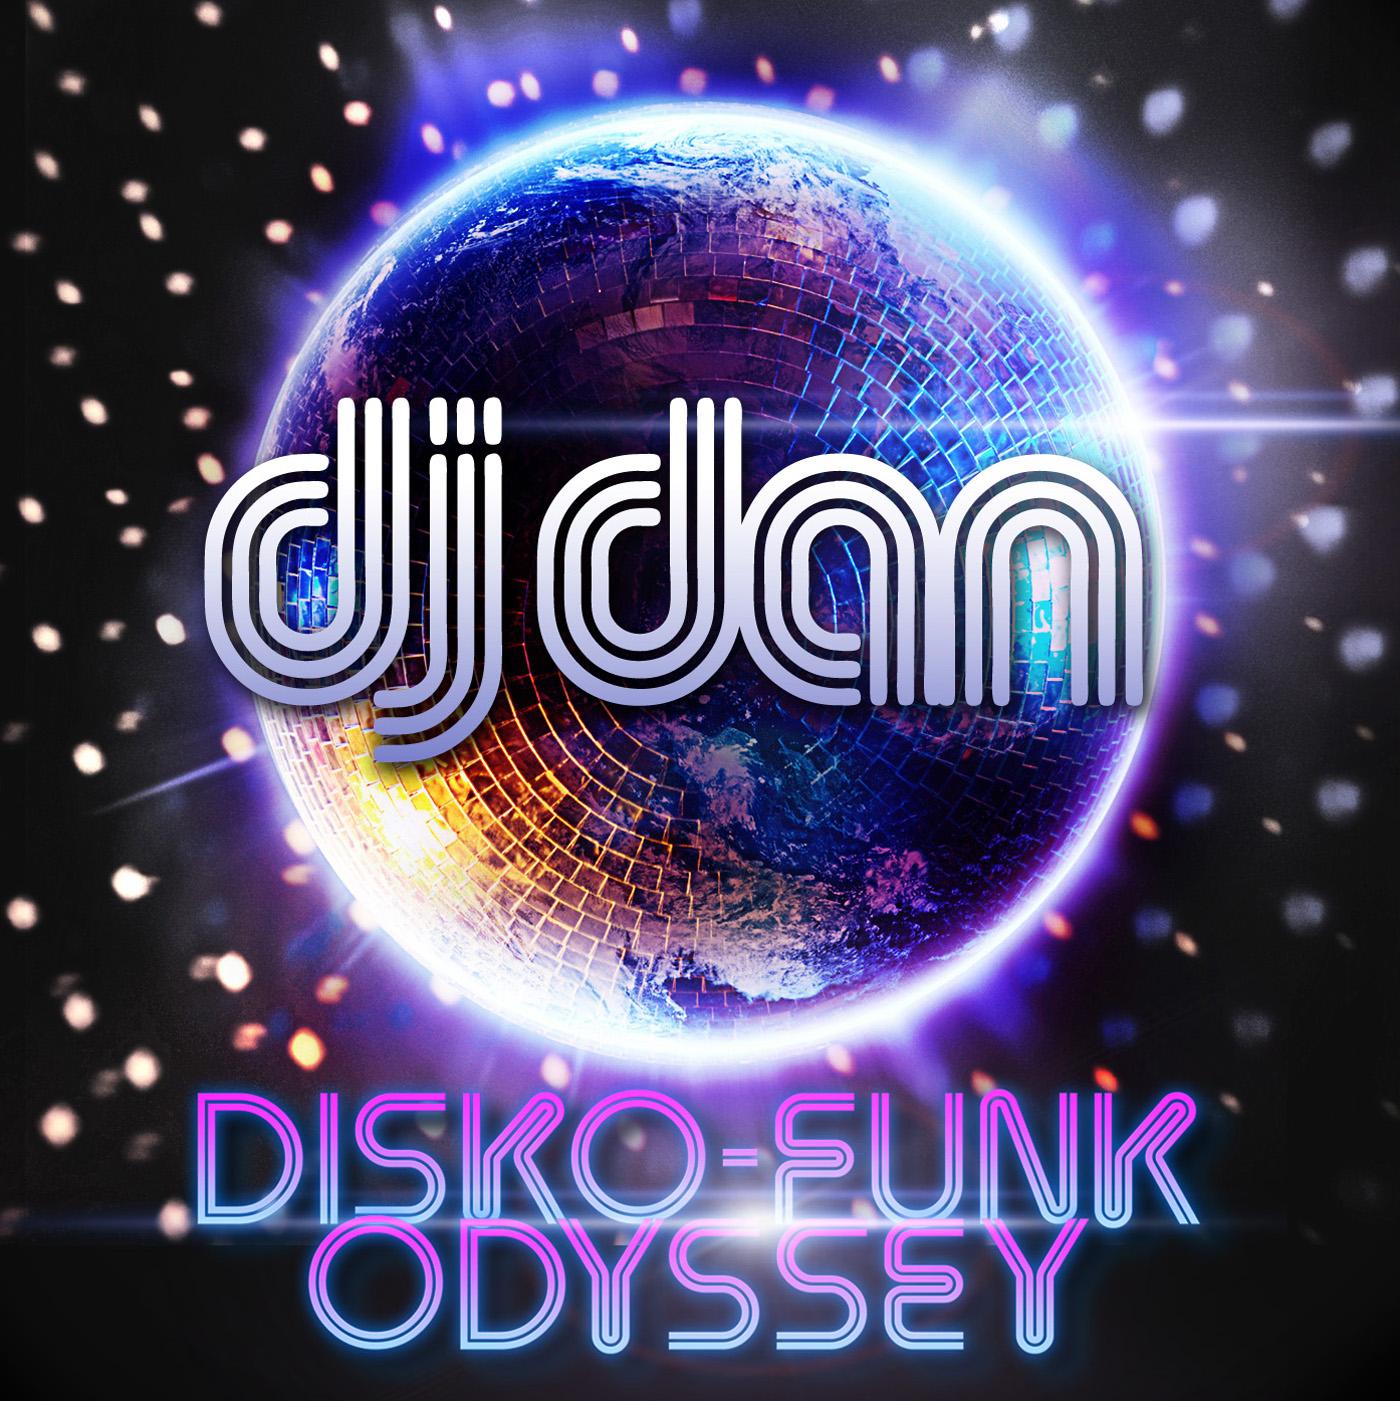 DiskoFunkOdyssey_CVR_FINAL.jpg